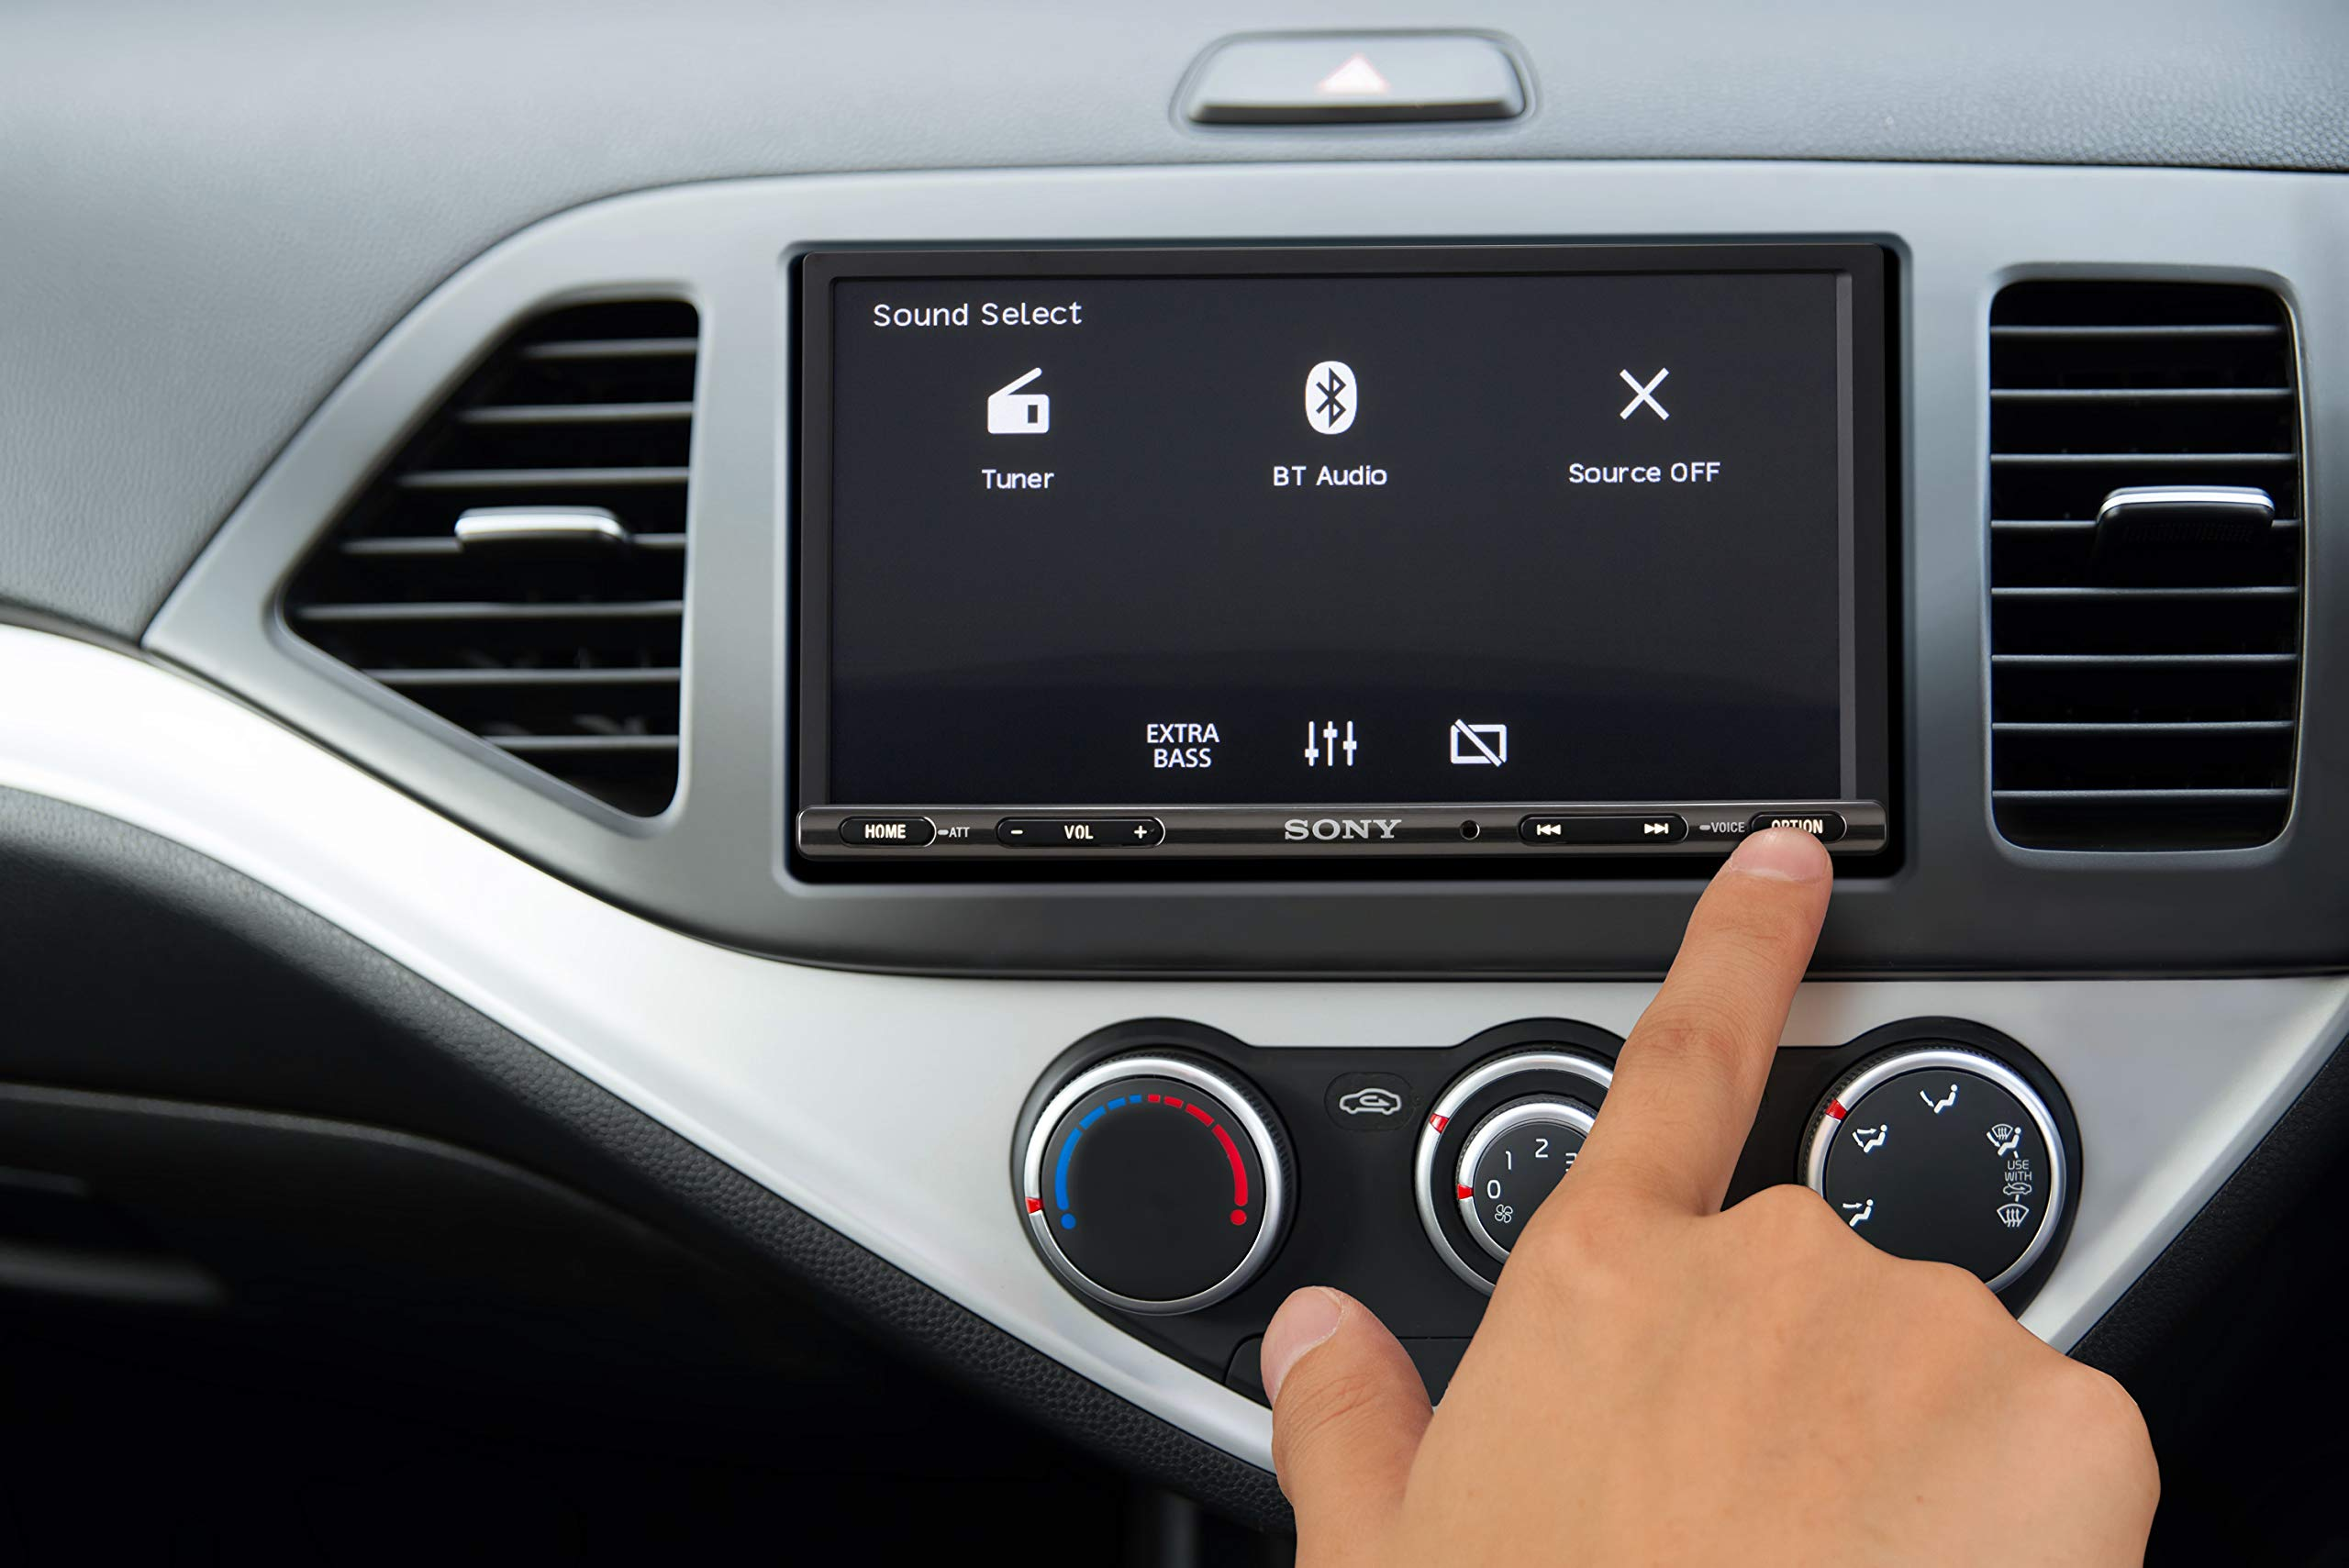 Sony-XAV-AX3005-Premium-Media-Receiver-695-Zoll-DAB-Bluetooth-Apple-CarPlay-Android-Auto